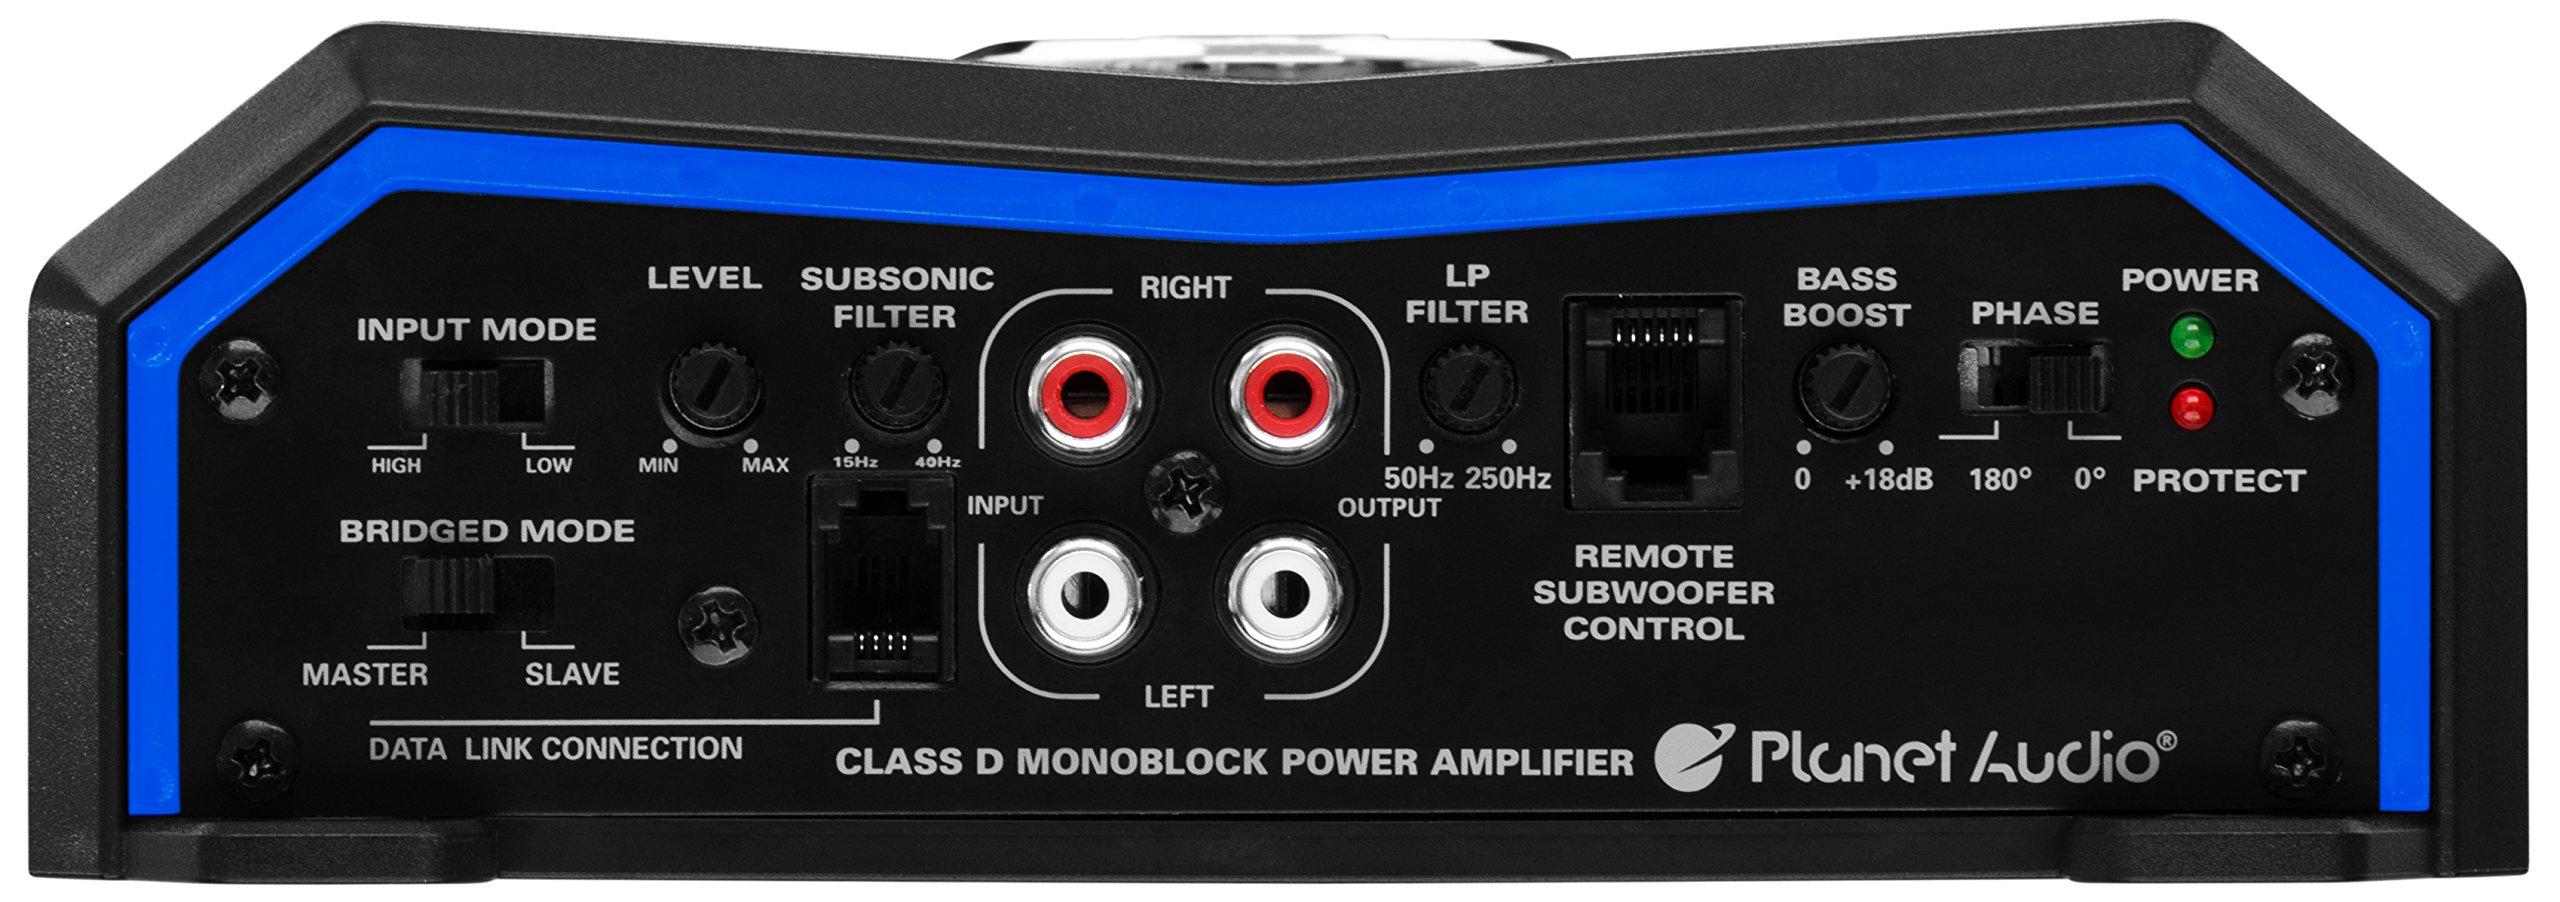 Planet Audio PL4000.1D Pulse 4000 Watt, 1 Ohm Stable Class D Monoblock Car Amplifier with Remote Subwoofer Control by Planet Audio (Image #4)